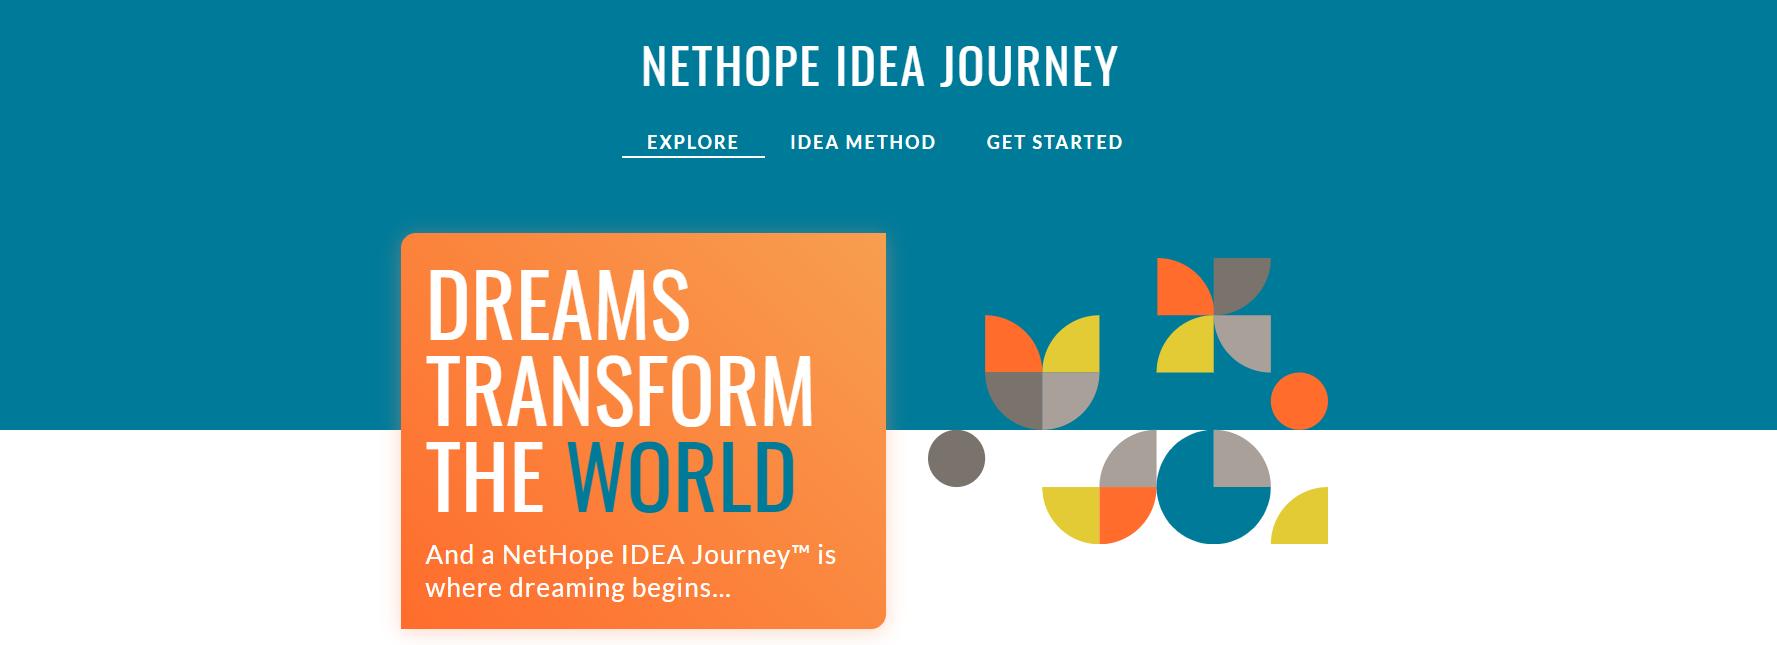 NetHope IDEA Journey landing page, written by Stone Barrell